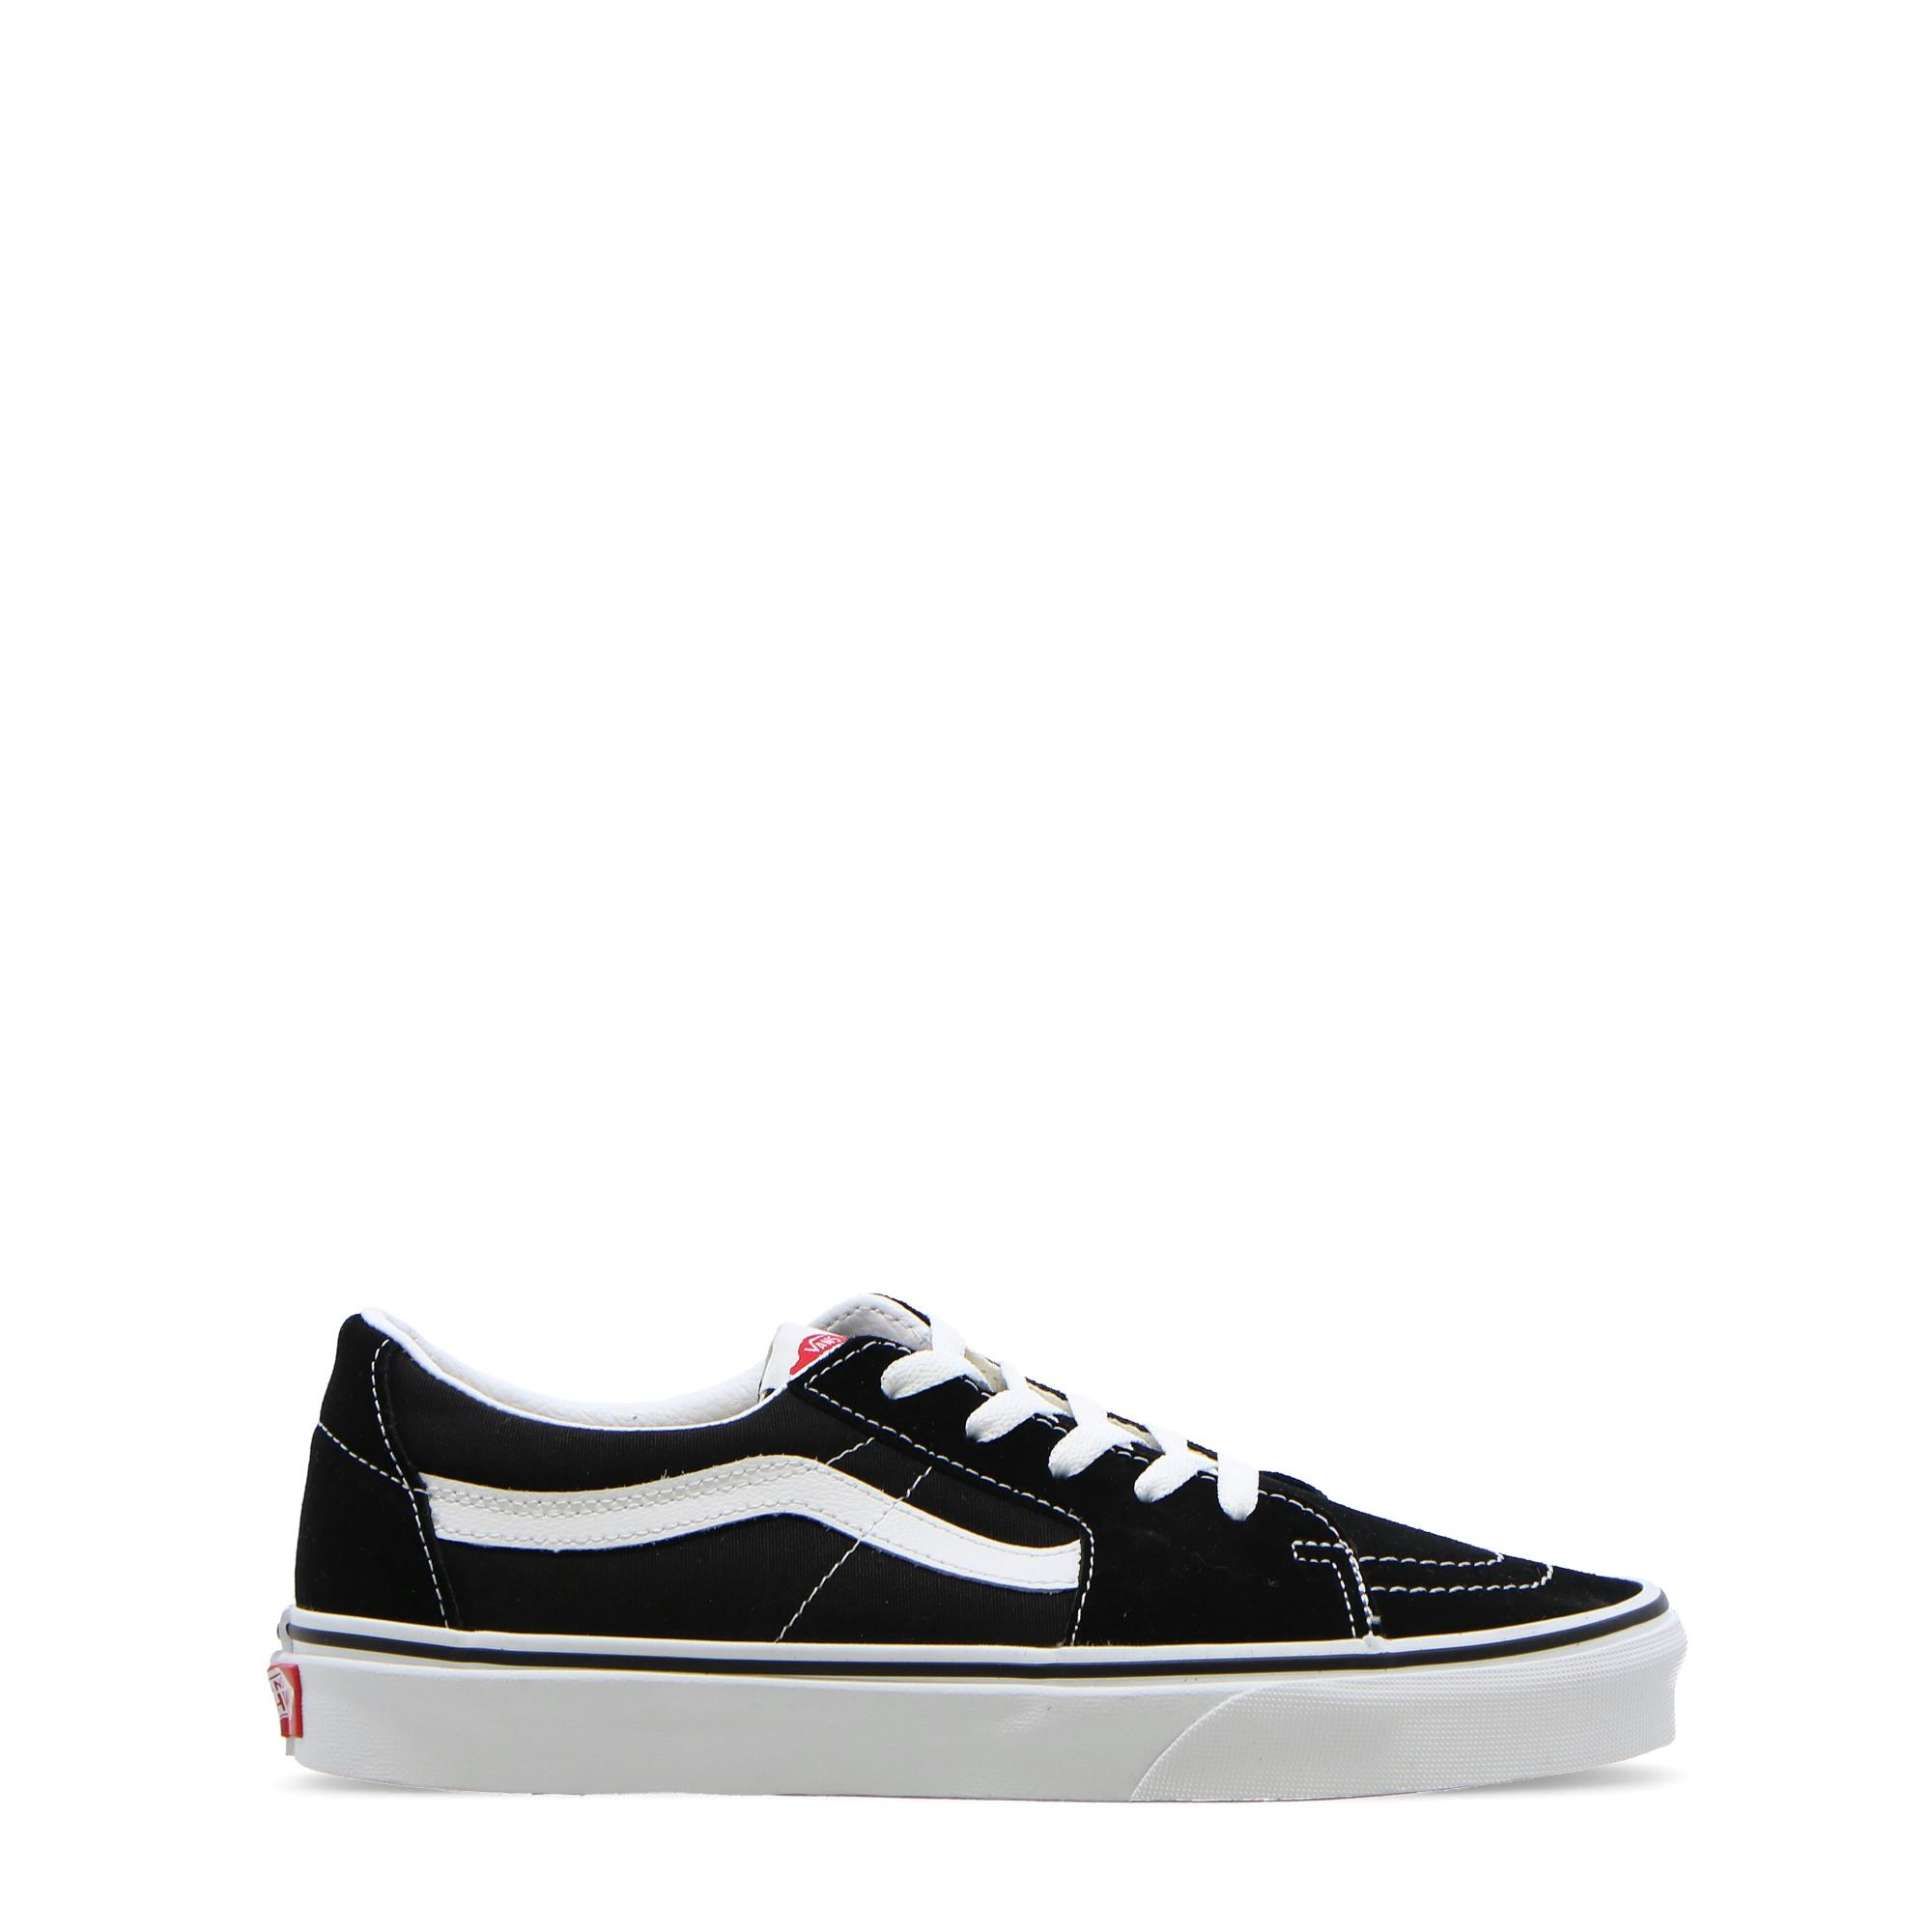 Vans Ua Sk8-low Black true white